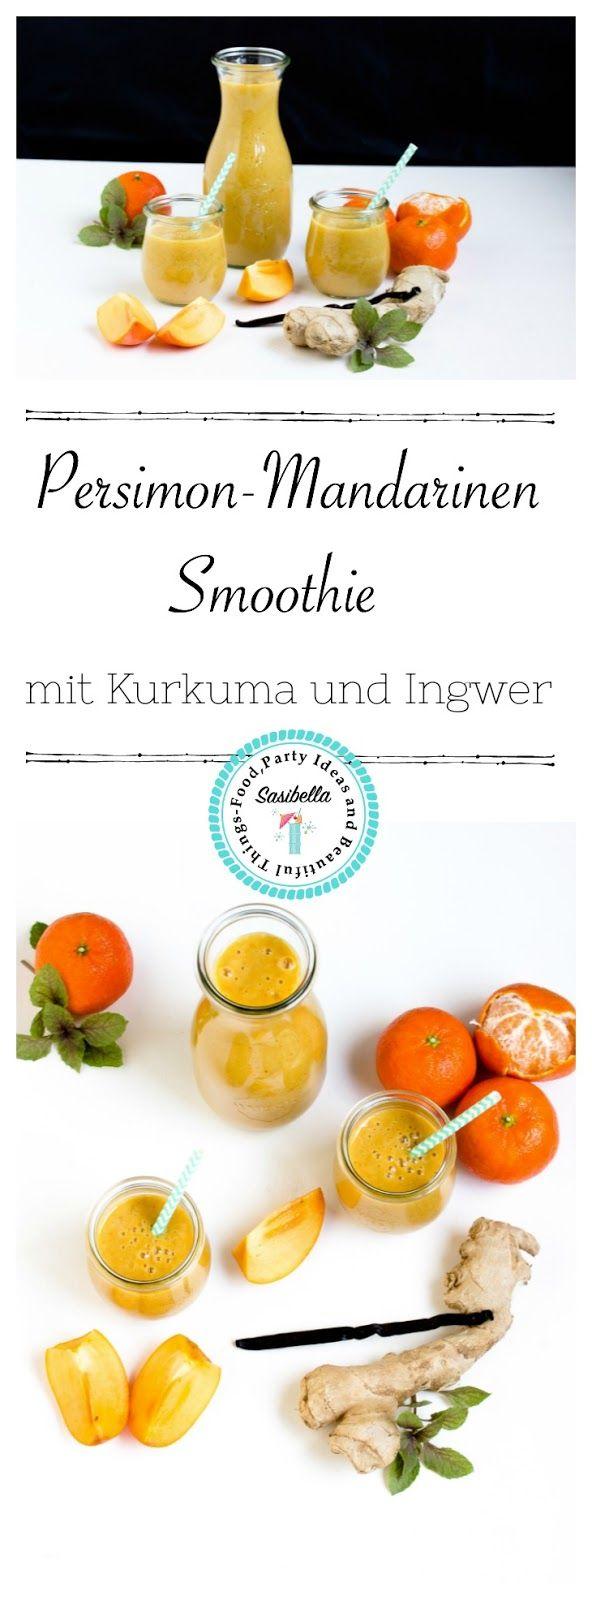 "Persimon-Mandarinen Smoothie mit Kurkuma und Ingwer ""Mein Frühstücksglück"" - Sasibella"